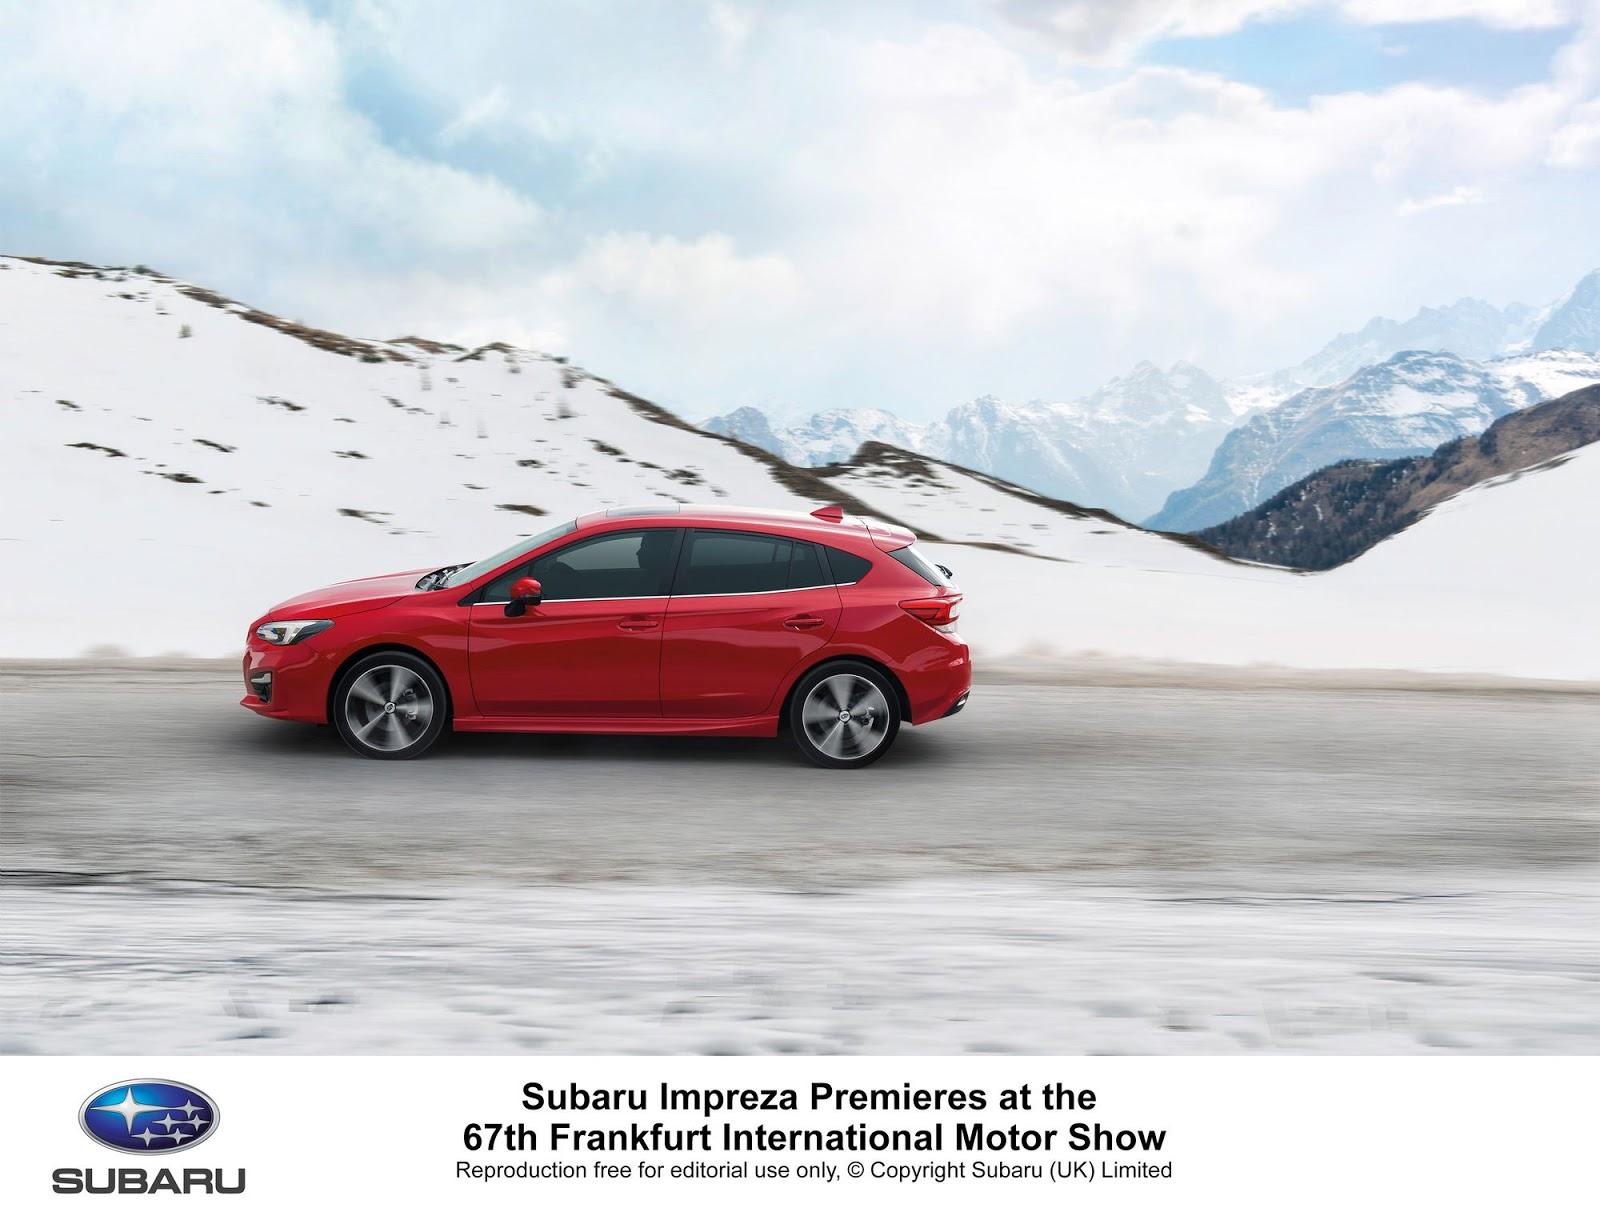 2018-Subaru-Impreza-12